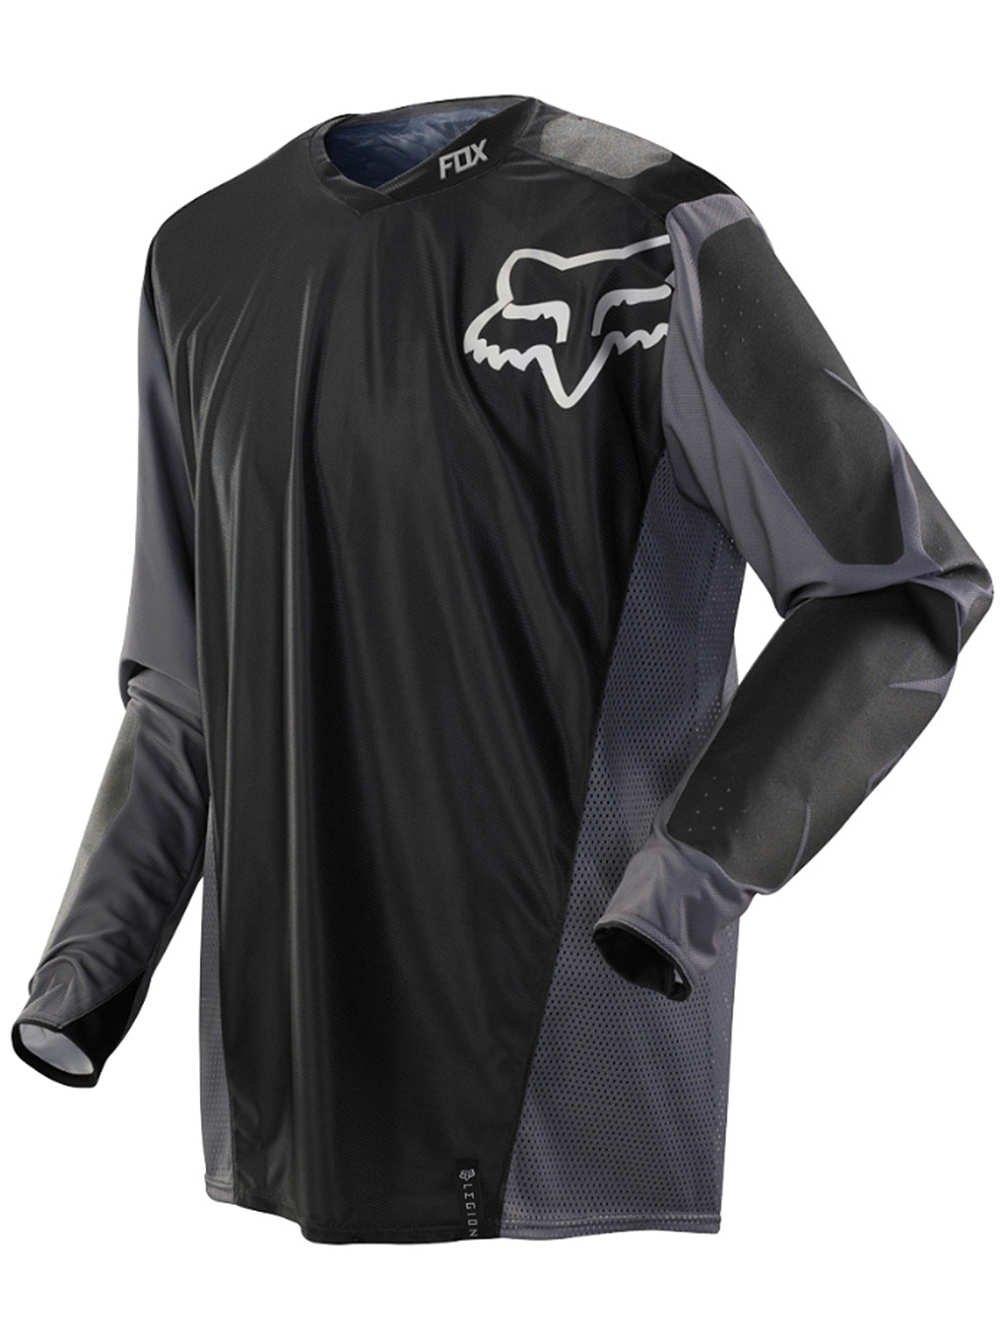 Fox Racing Legion Offroad Men's MX Motorcycle Jerseys - Black/Grey/Small